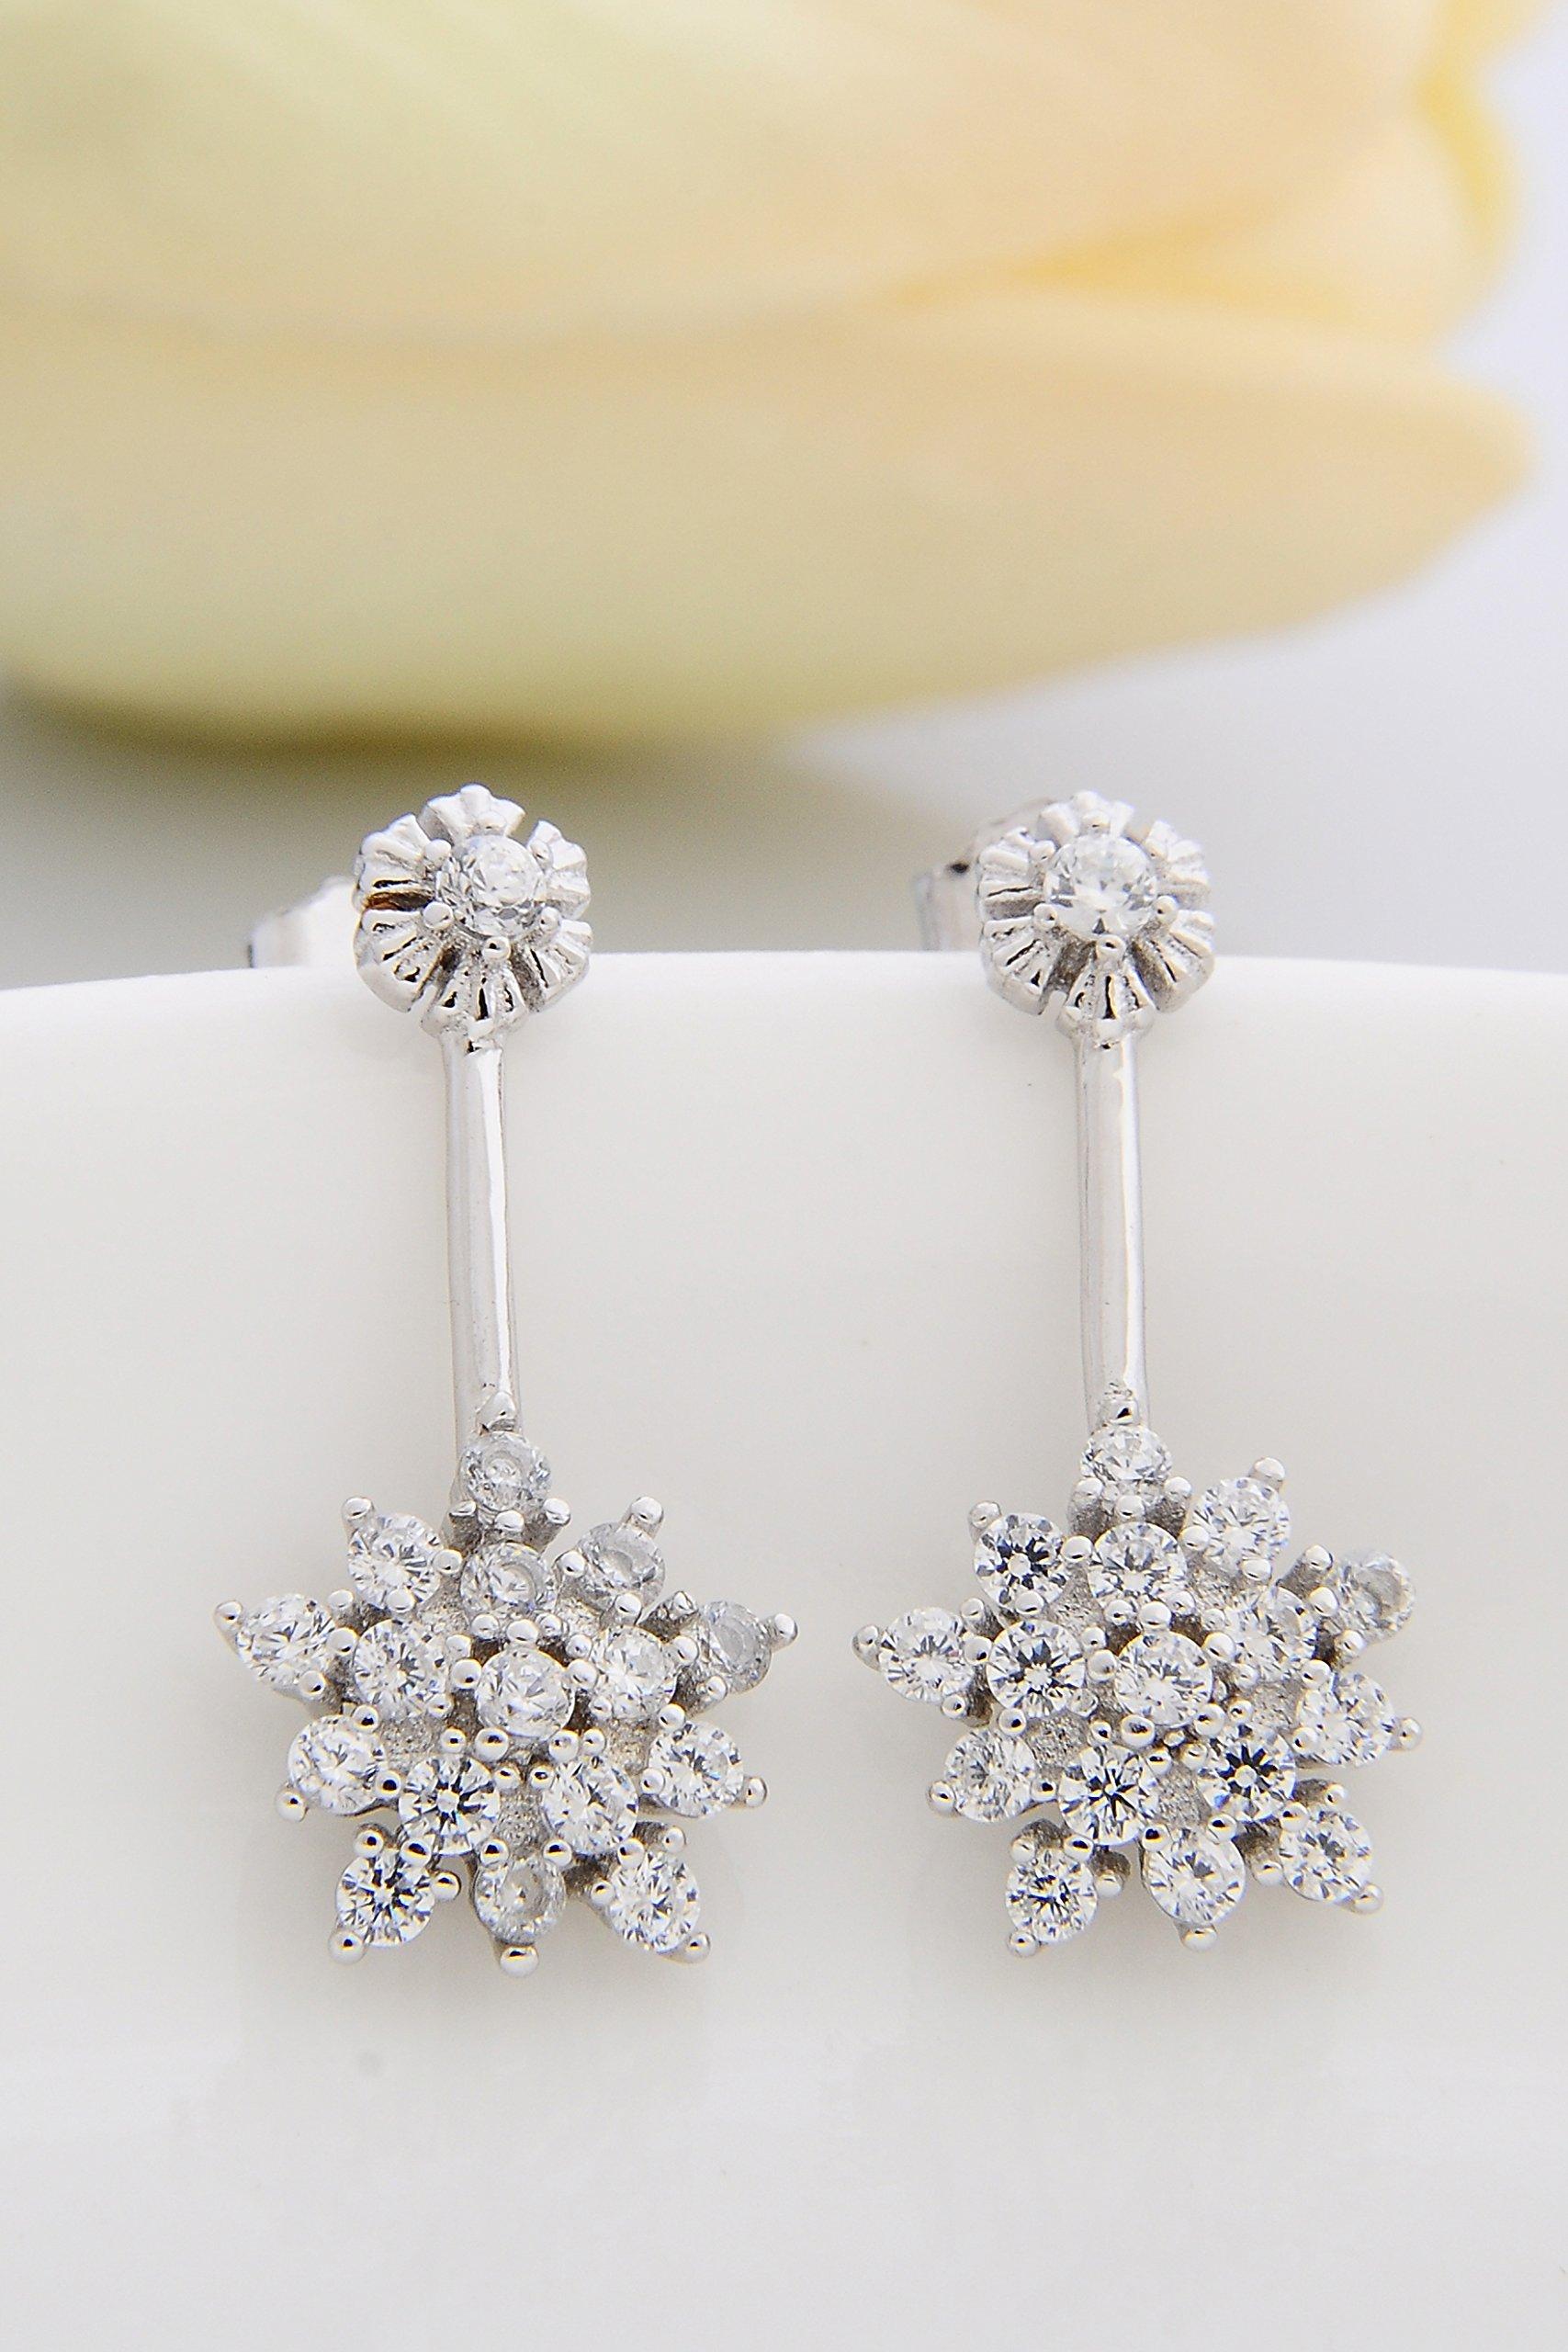 Thai Love You Snowflake Earrings earings Dangler Eardrop s925 Sterling Silver Women Girls Personality Elegant Woman Presents Unique Fashion Jewelry